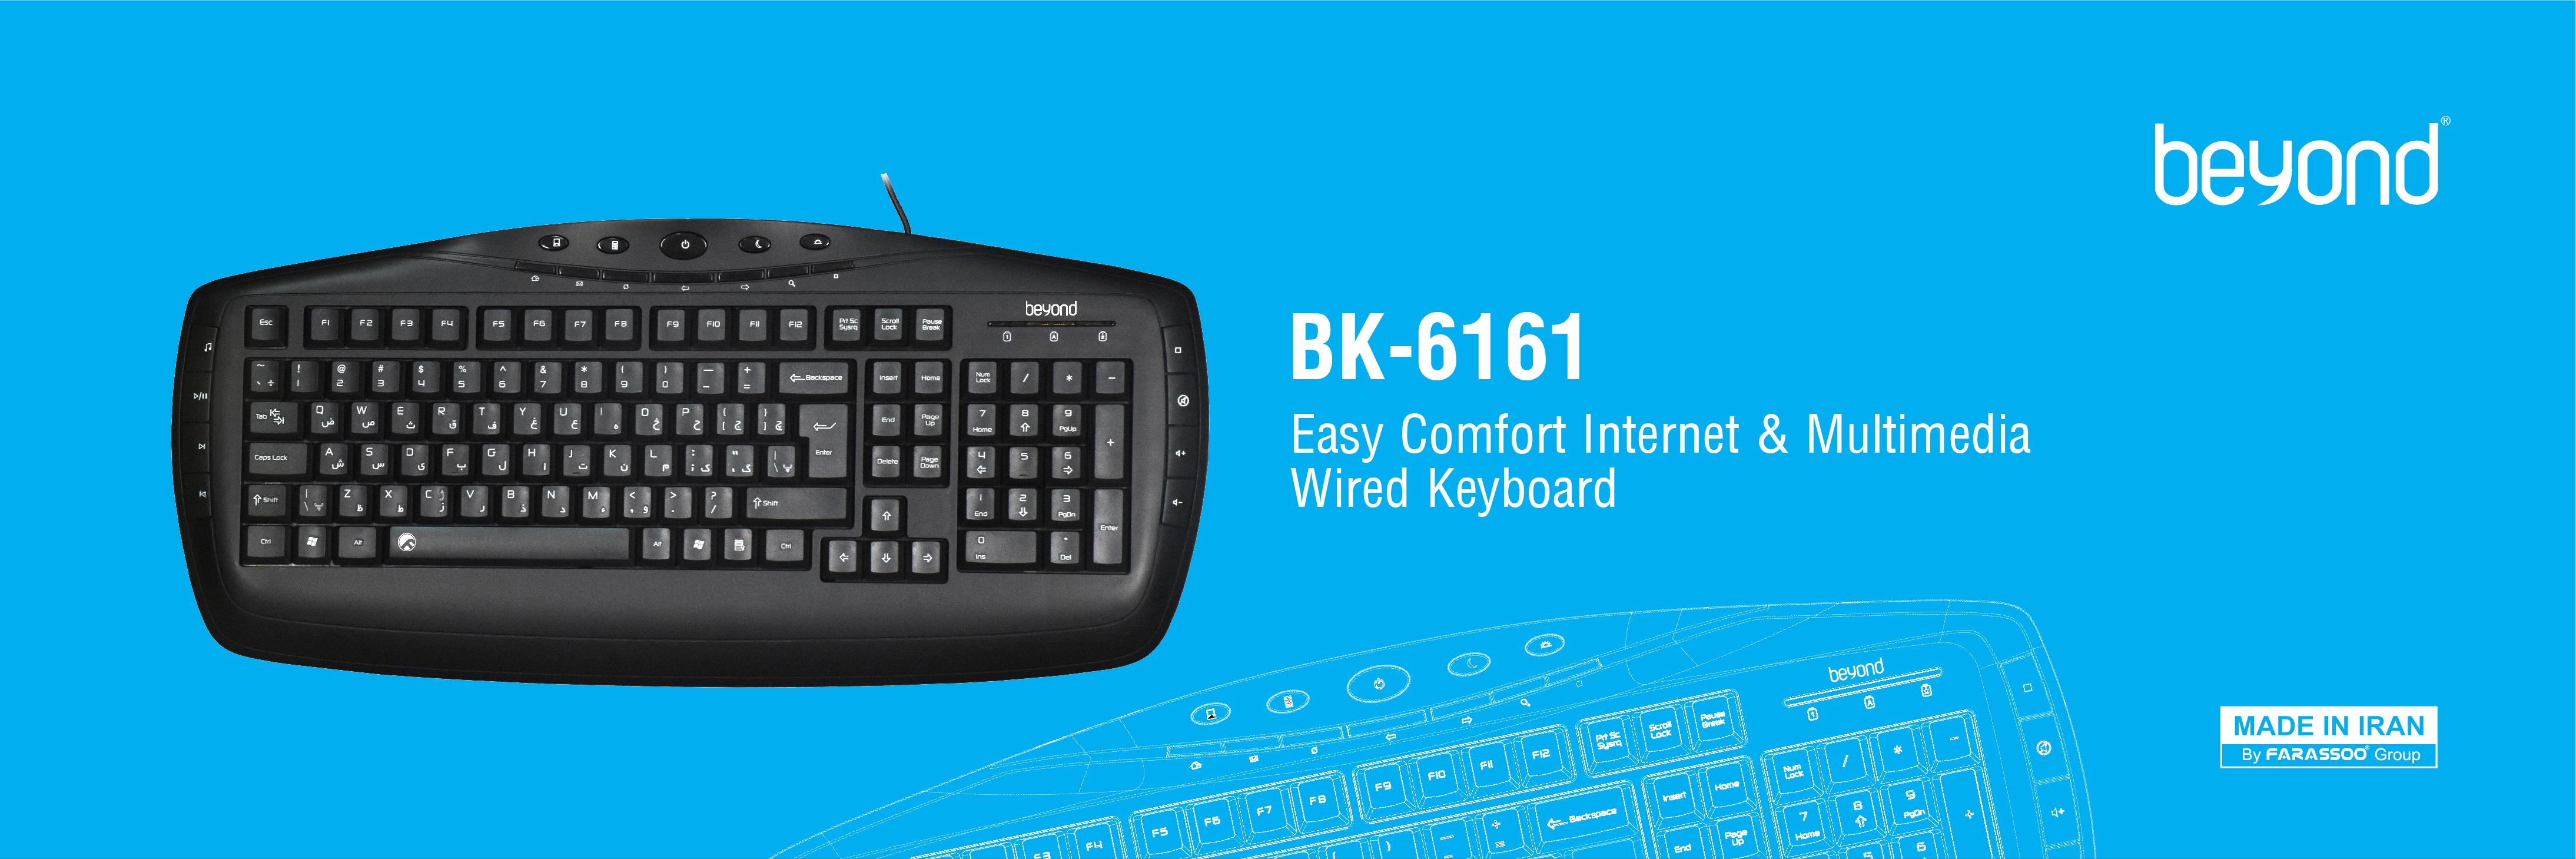 BK-6161